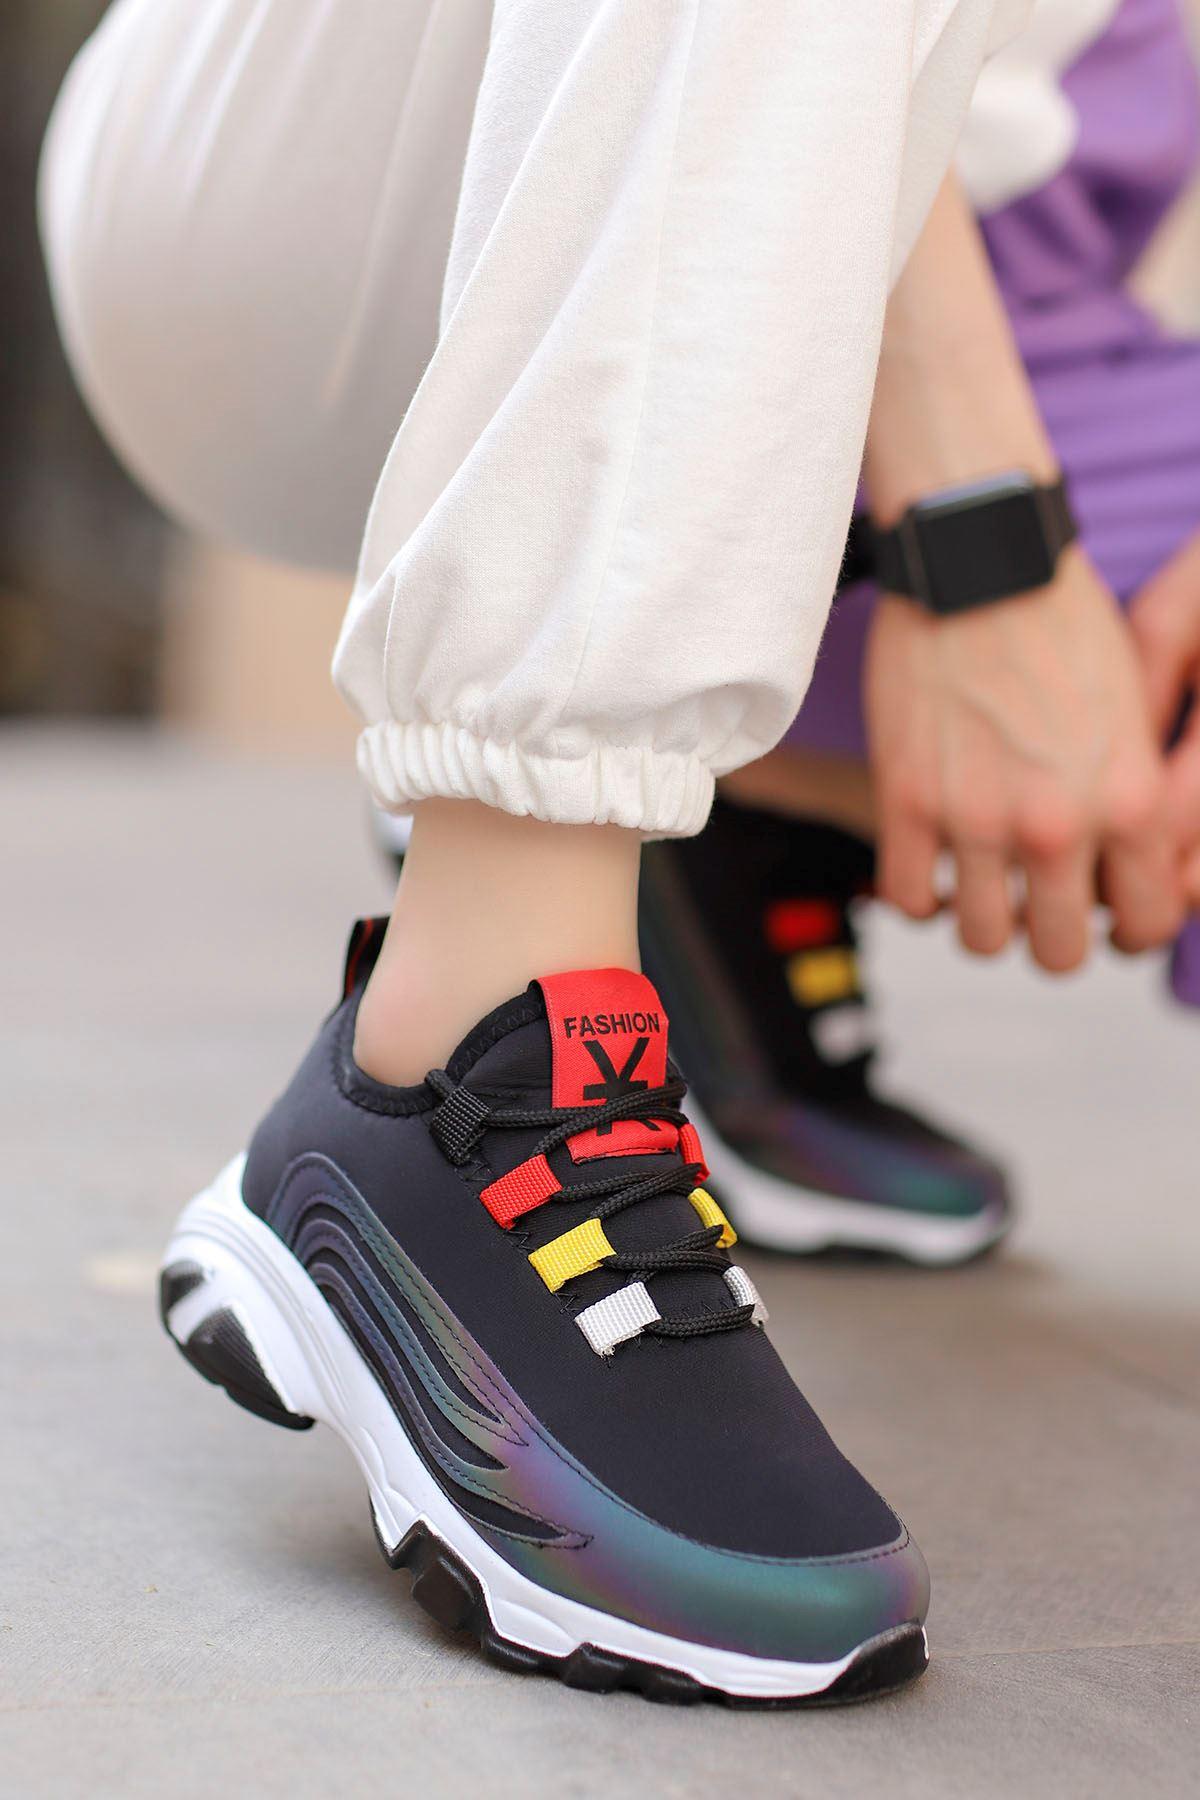 Napa Siyah Bağlı Sneakers